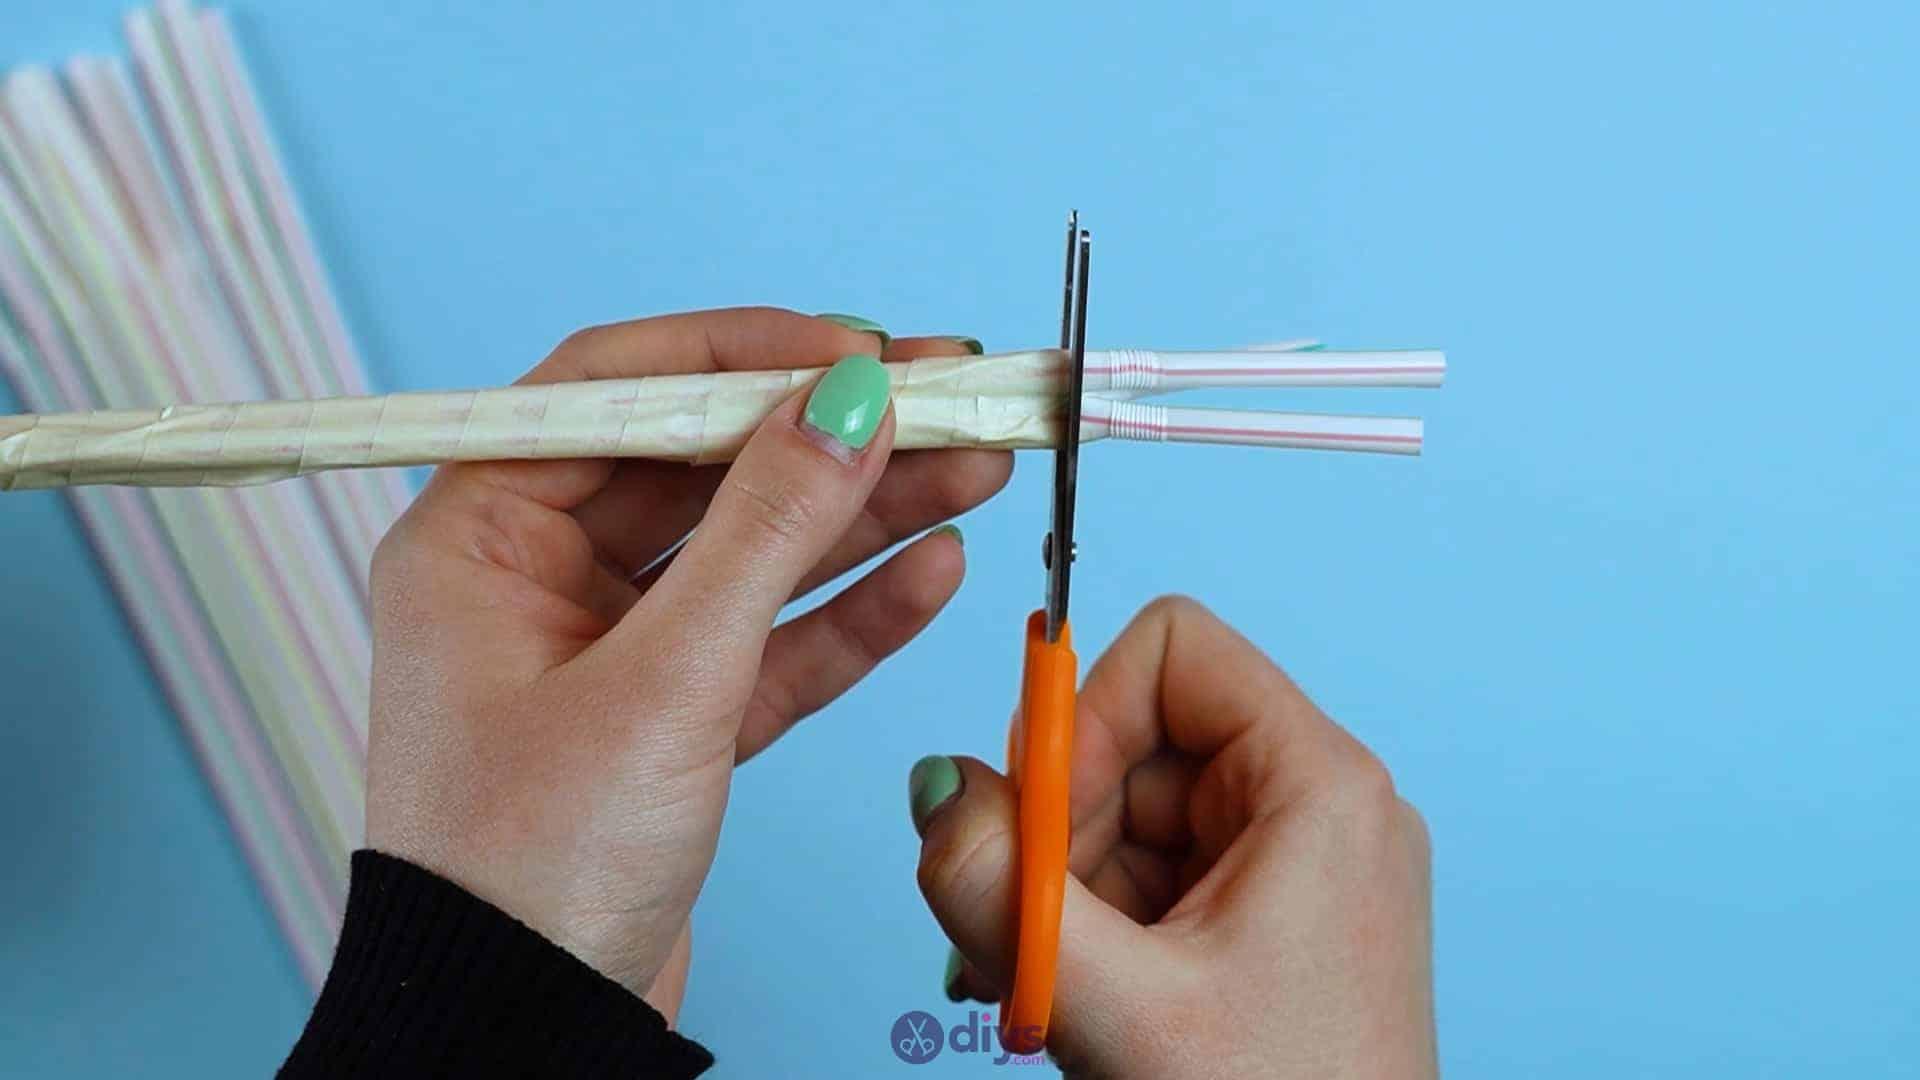 Diy concrete pencil holder step 2g